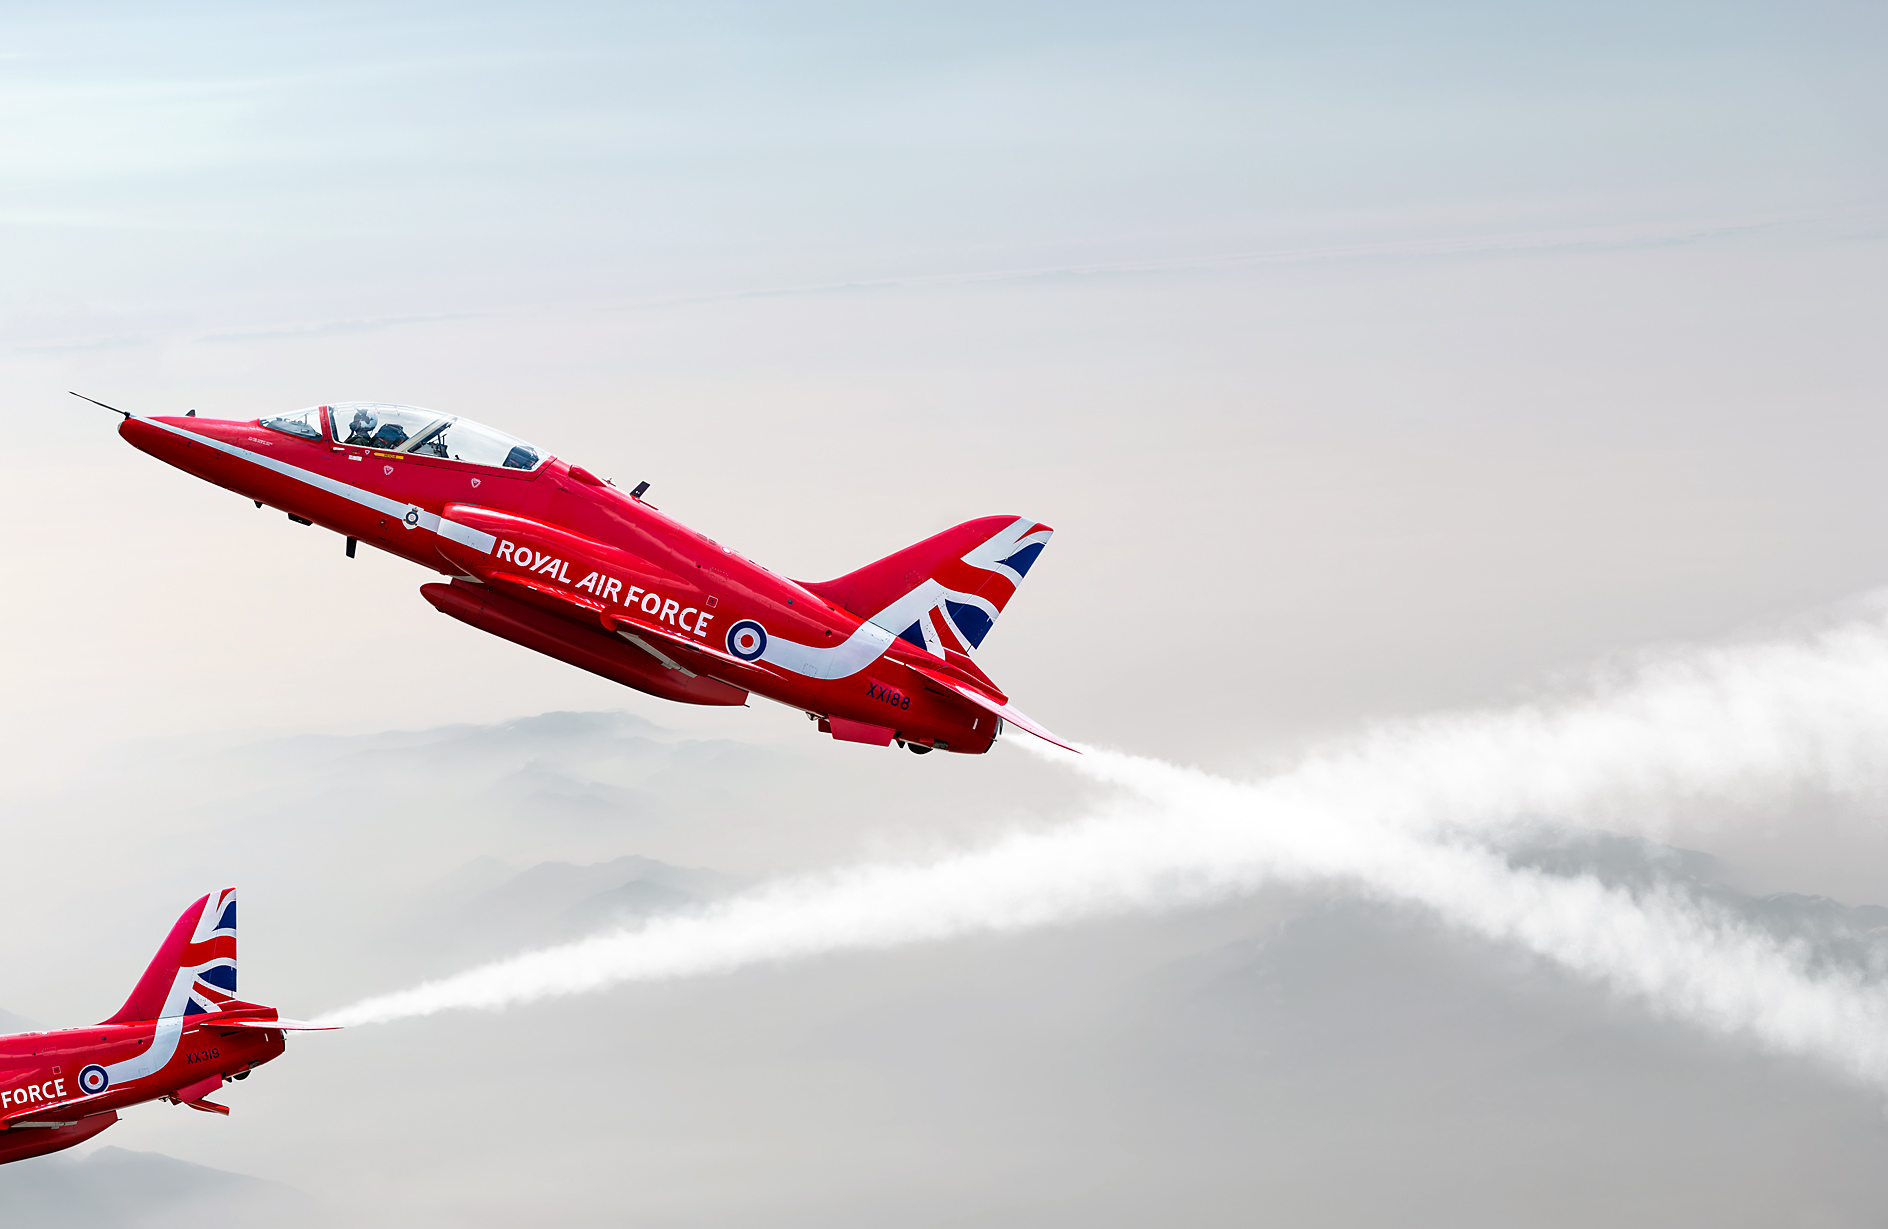 2D Red Arrows Jet Planes Photo Retouch Illustration